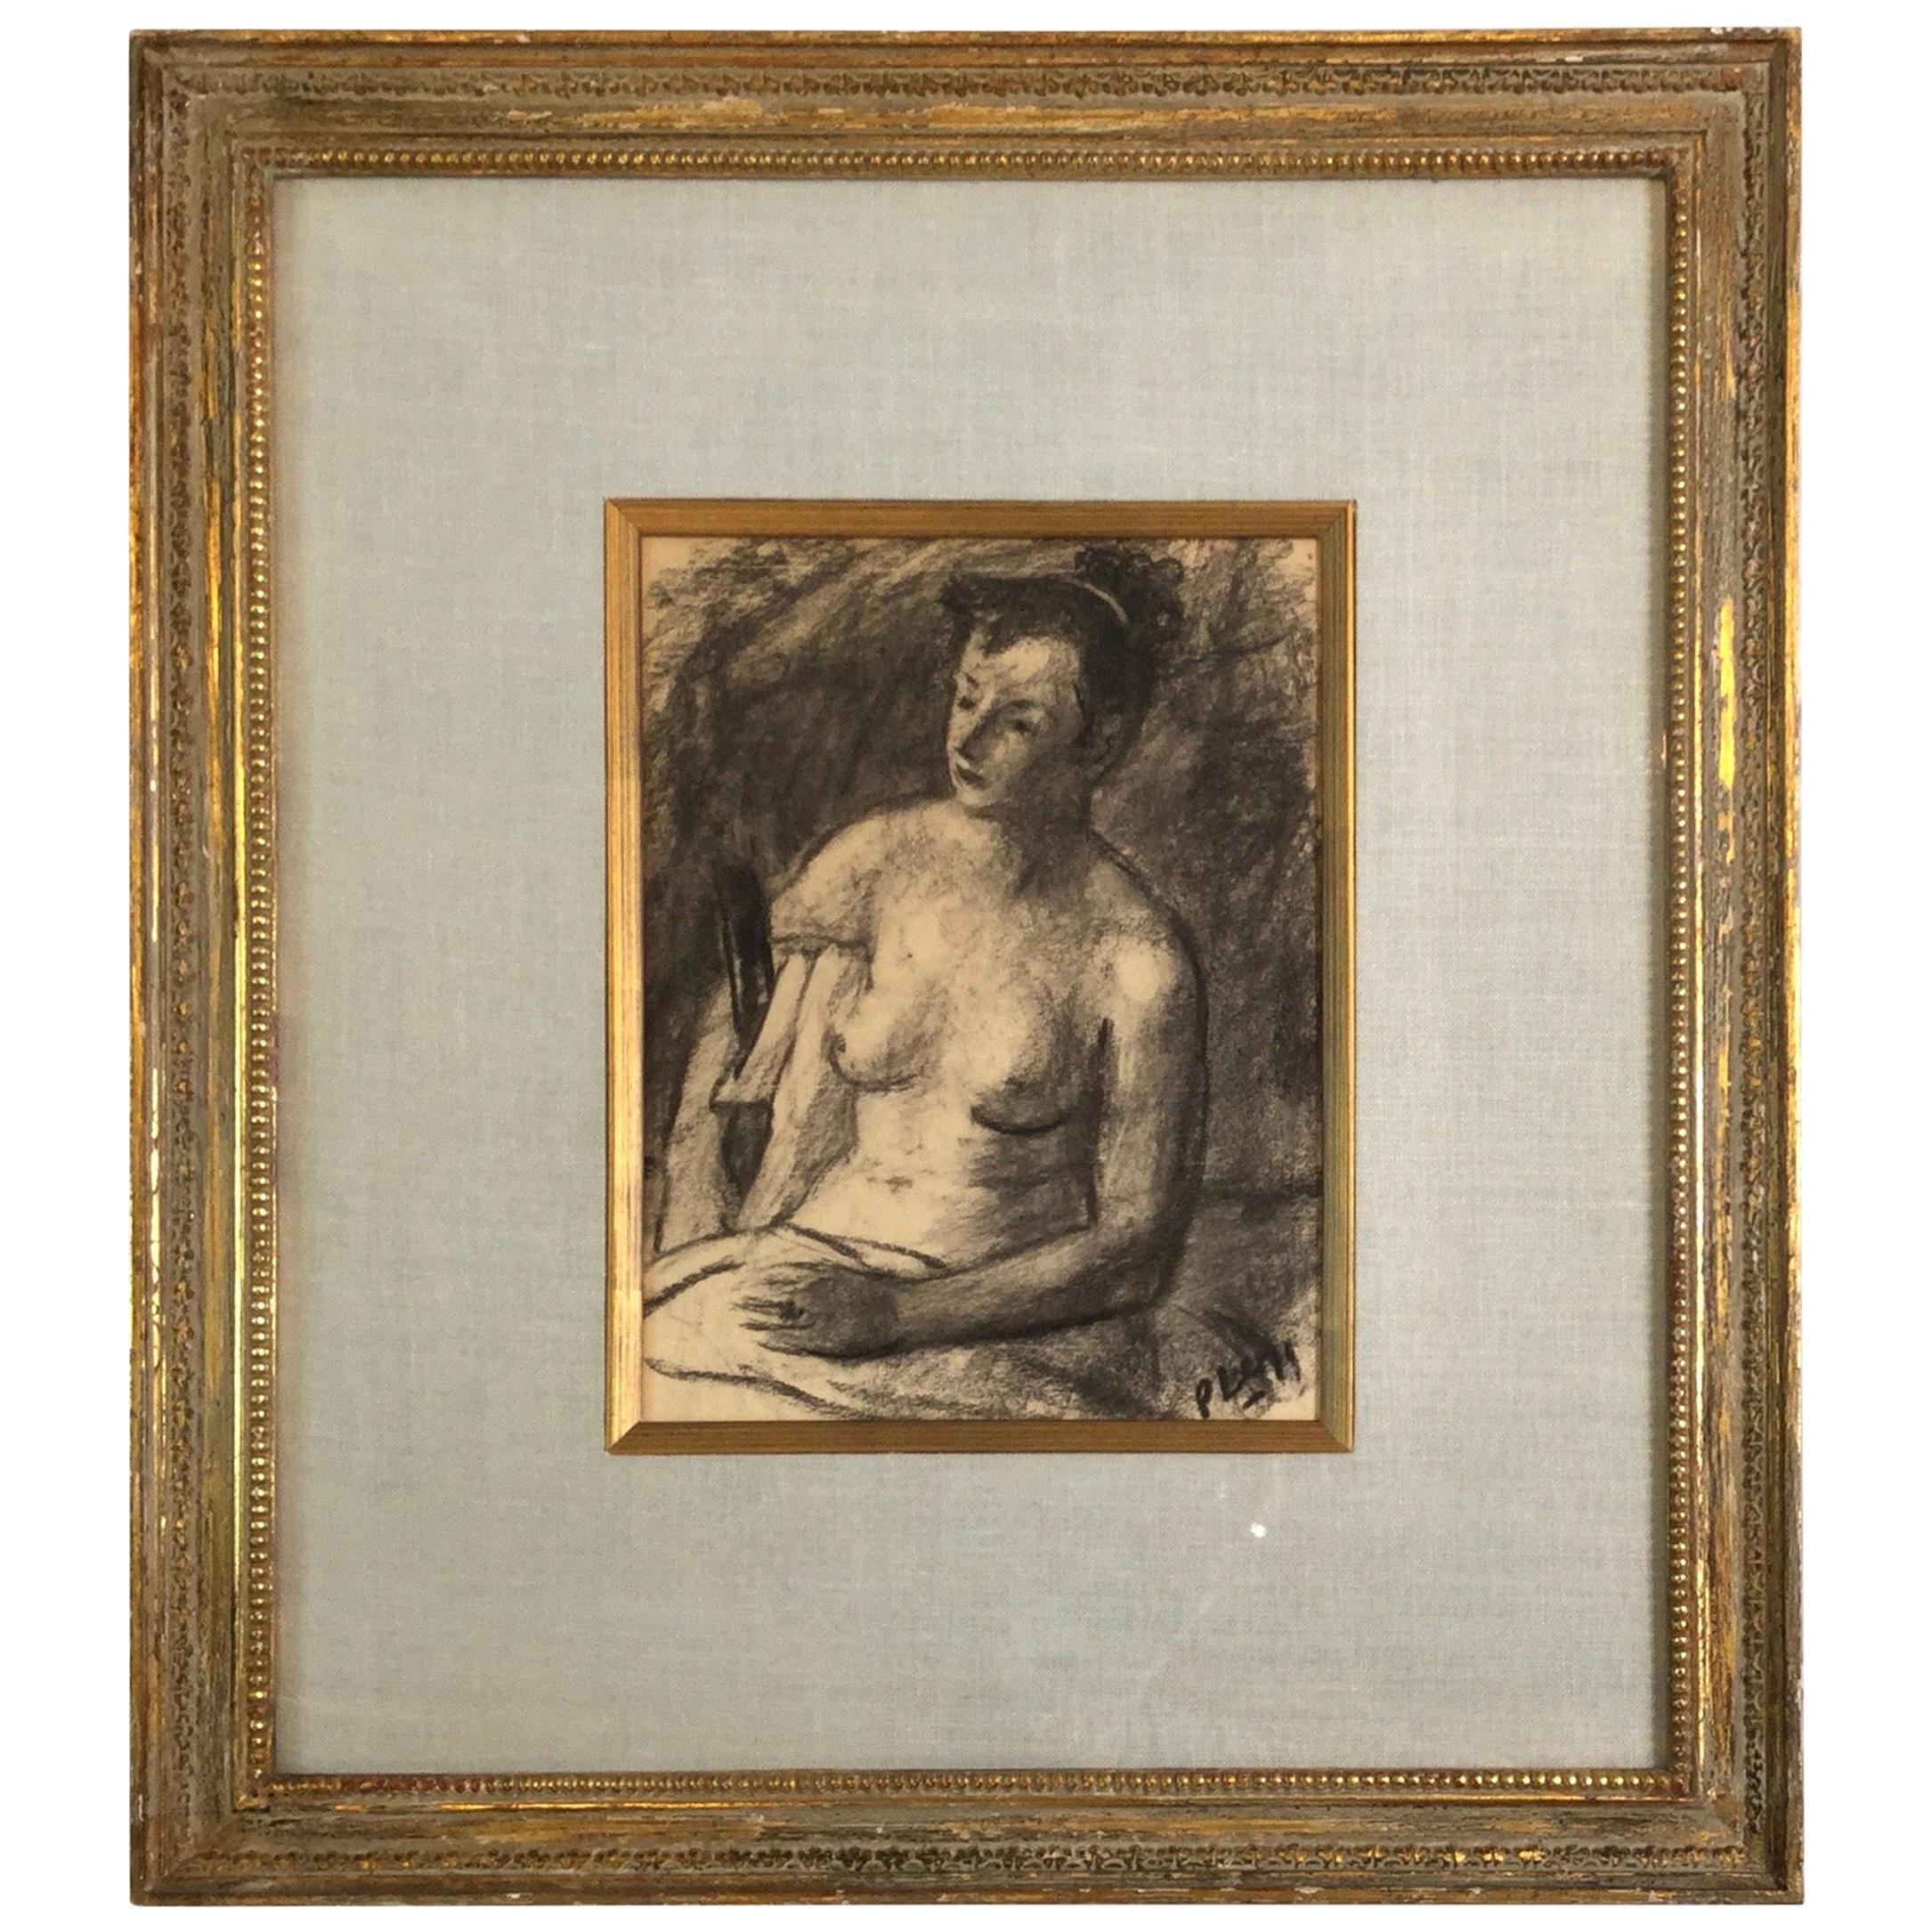 Robert Philipp Charcoal Nude on Paper